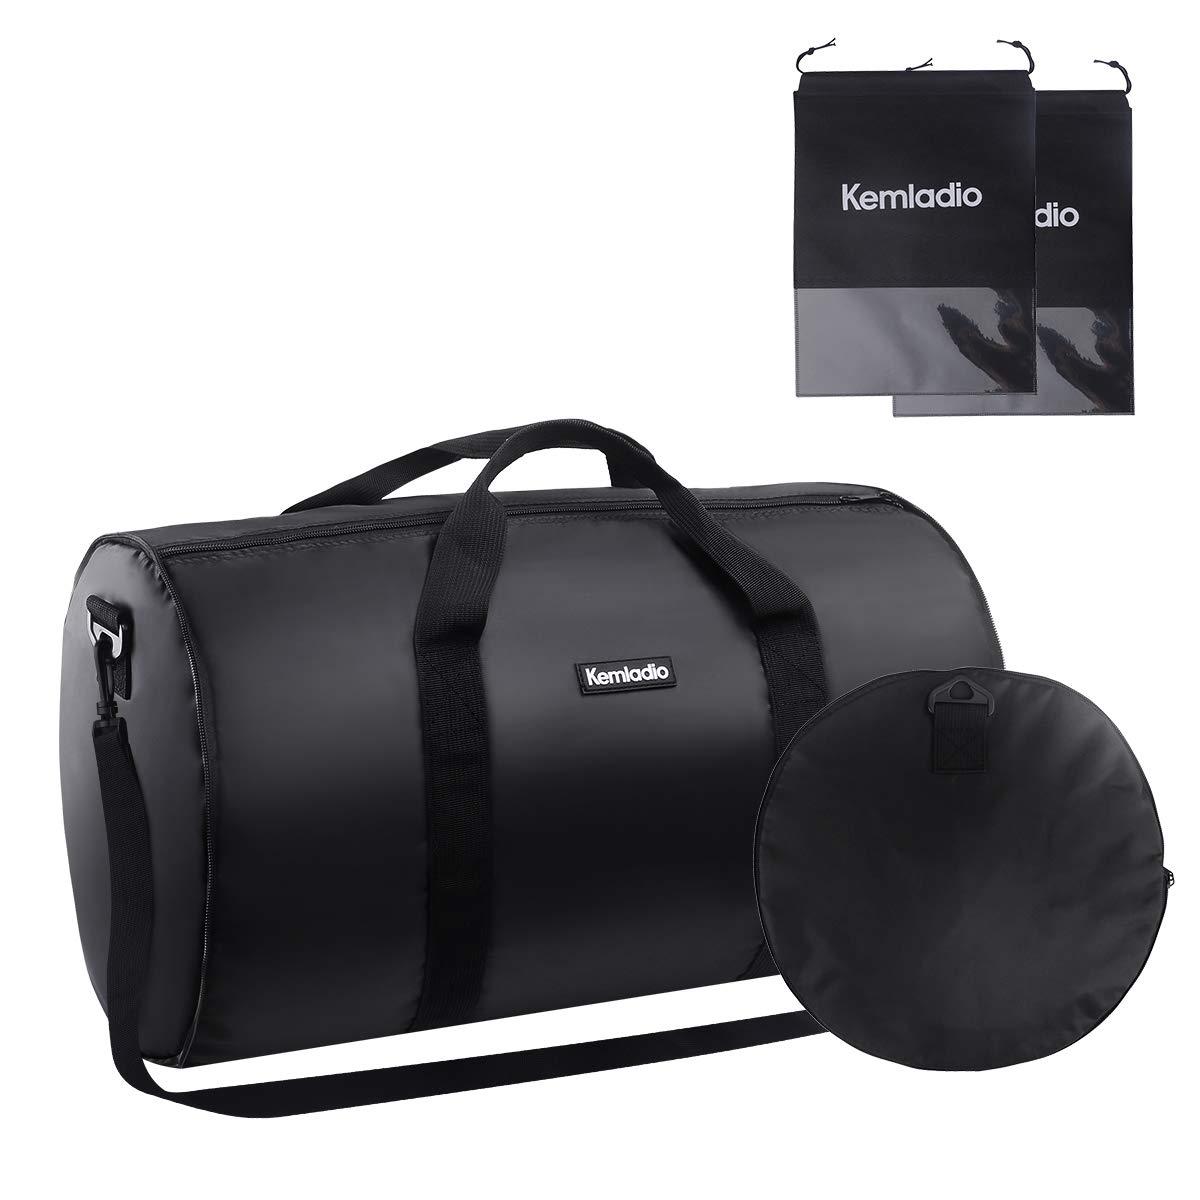 Foldable Lightweight Travel Duffle Bag, Kemladio Water Rresistant Packable Bag Luggage